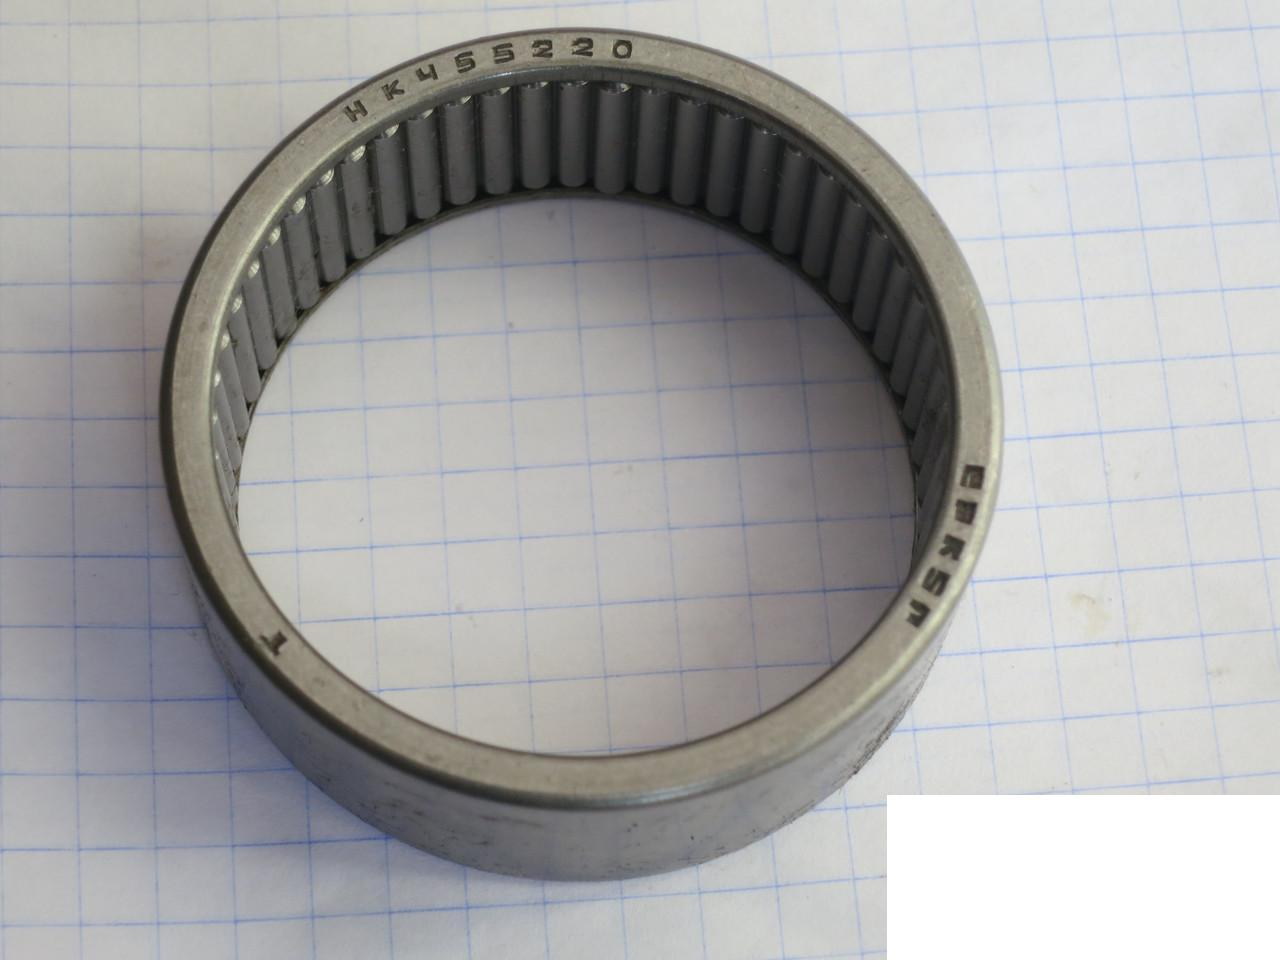 Подшипник НК455220 опорный шкворня Евро